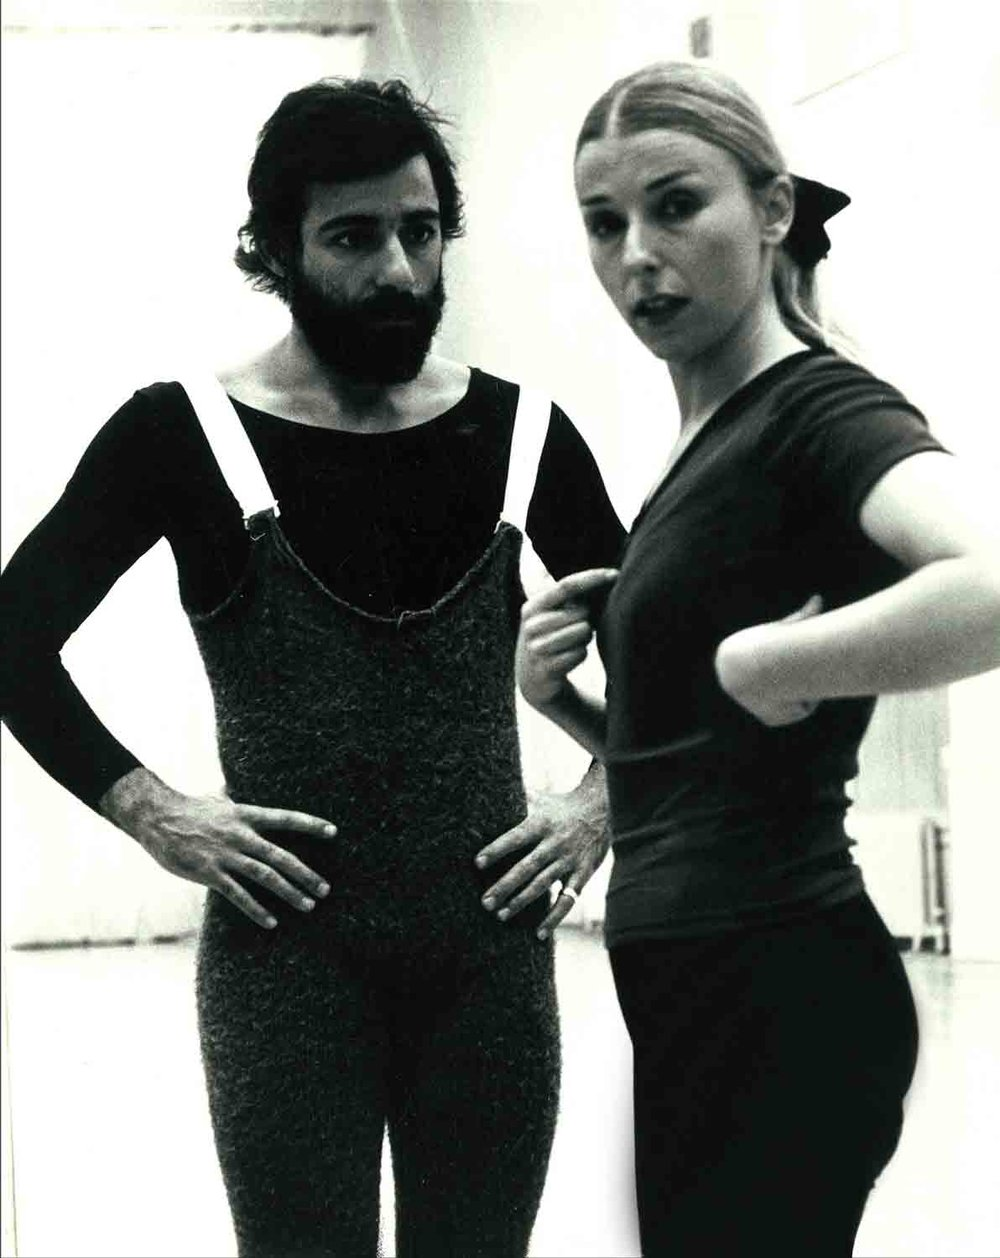 07_Dance-Theater_Phyllis-Lamhut-Dance-Company_1_1969.jpg